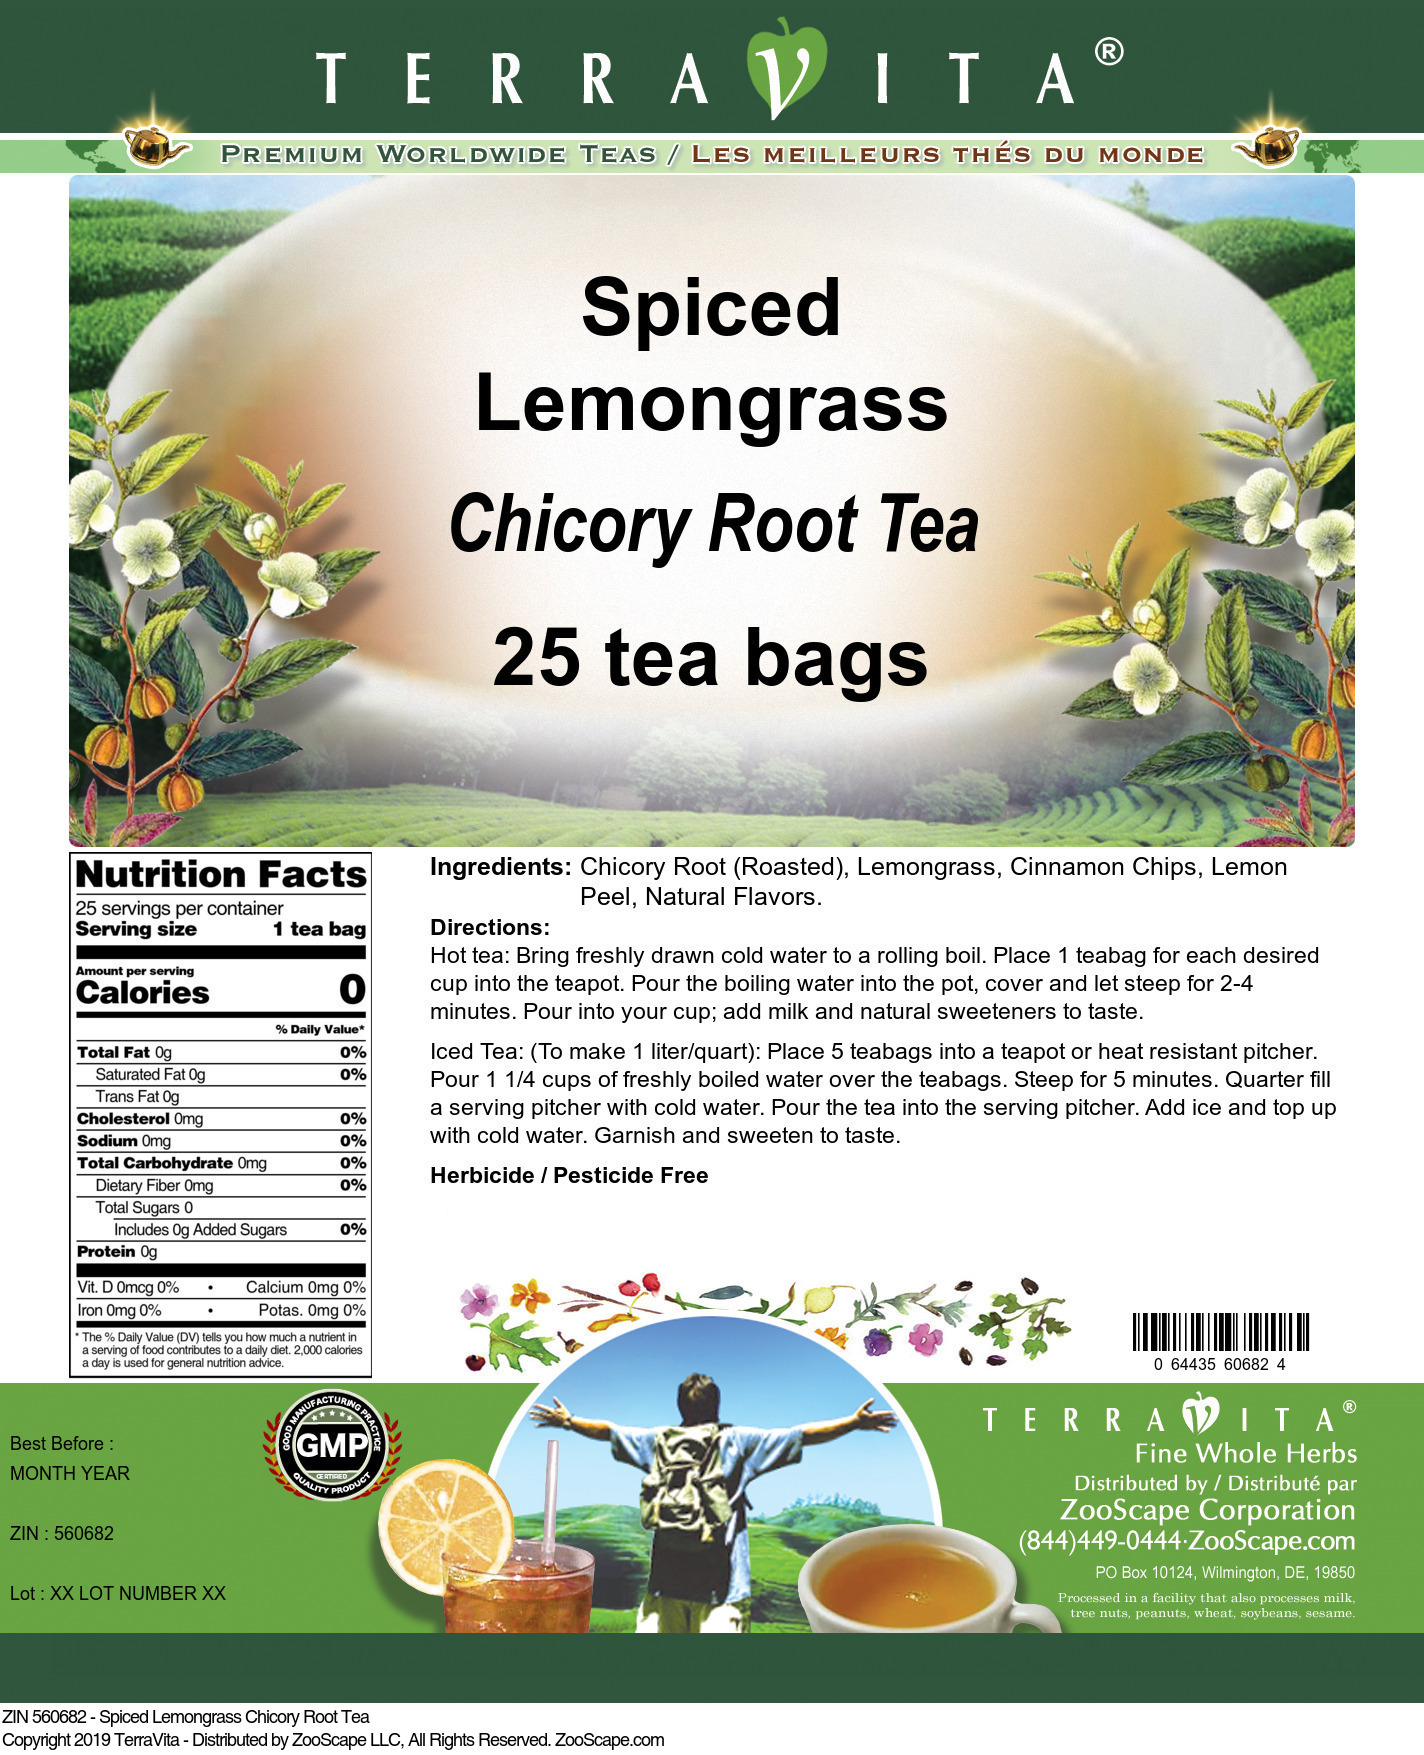 Spiced Lemongrass Chicory Root Tea